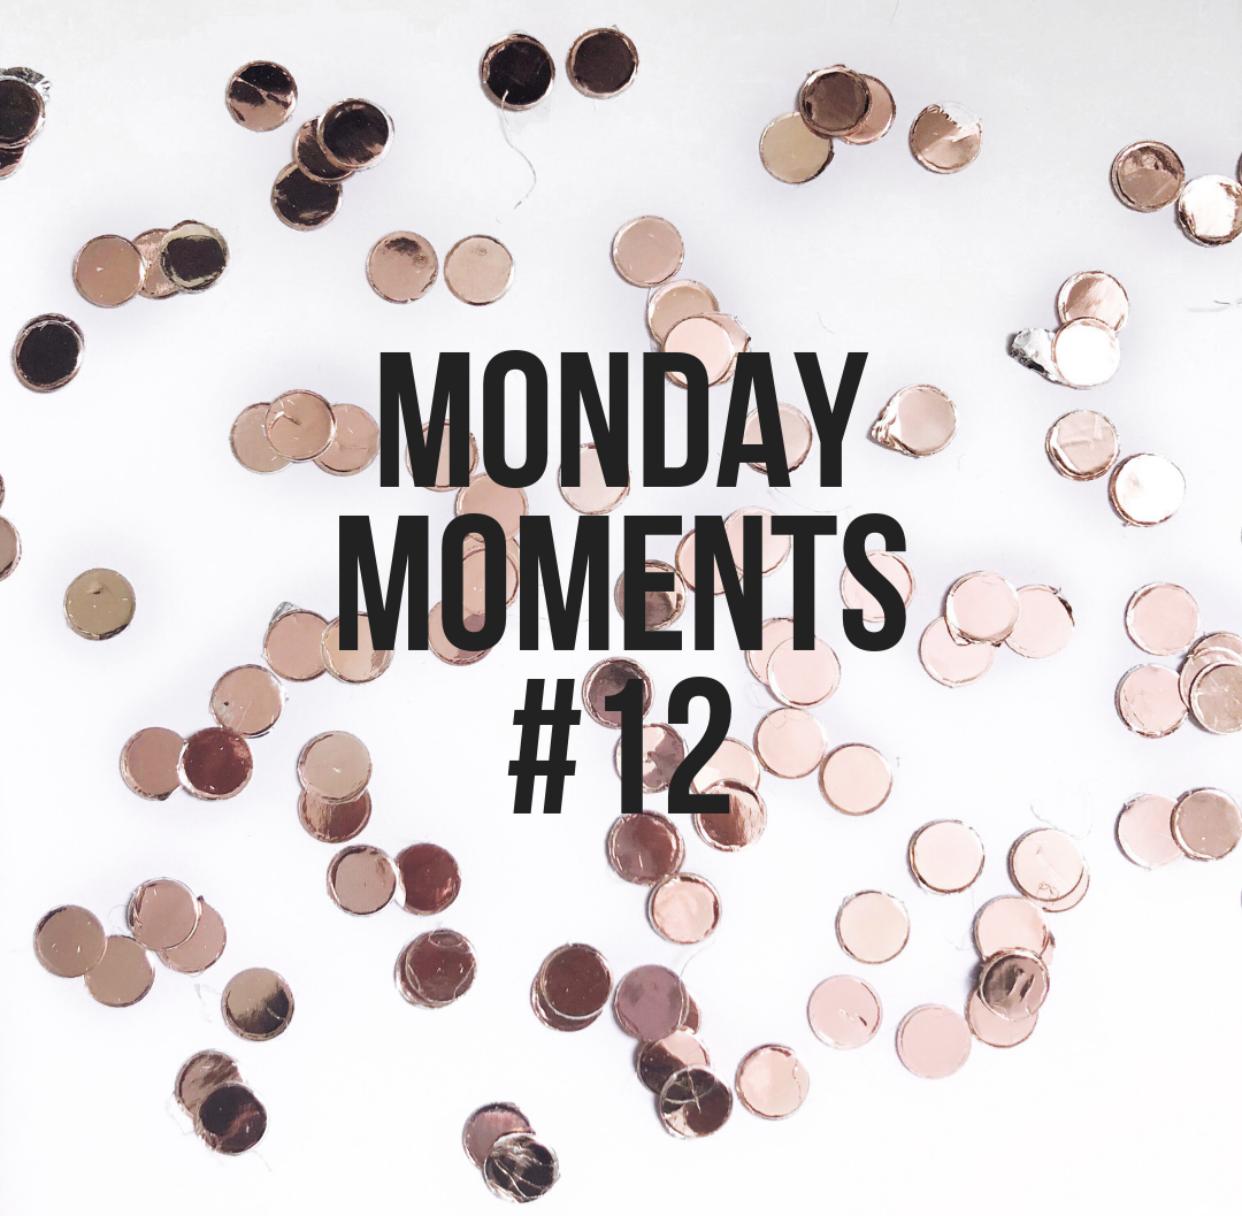 Monday Moment #12